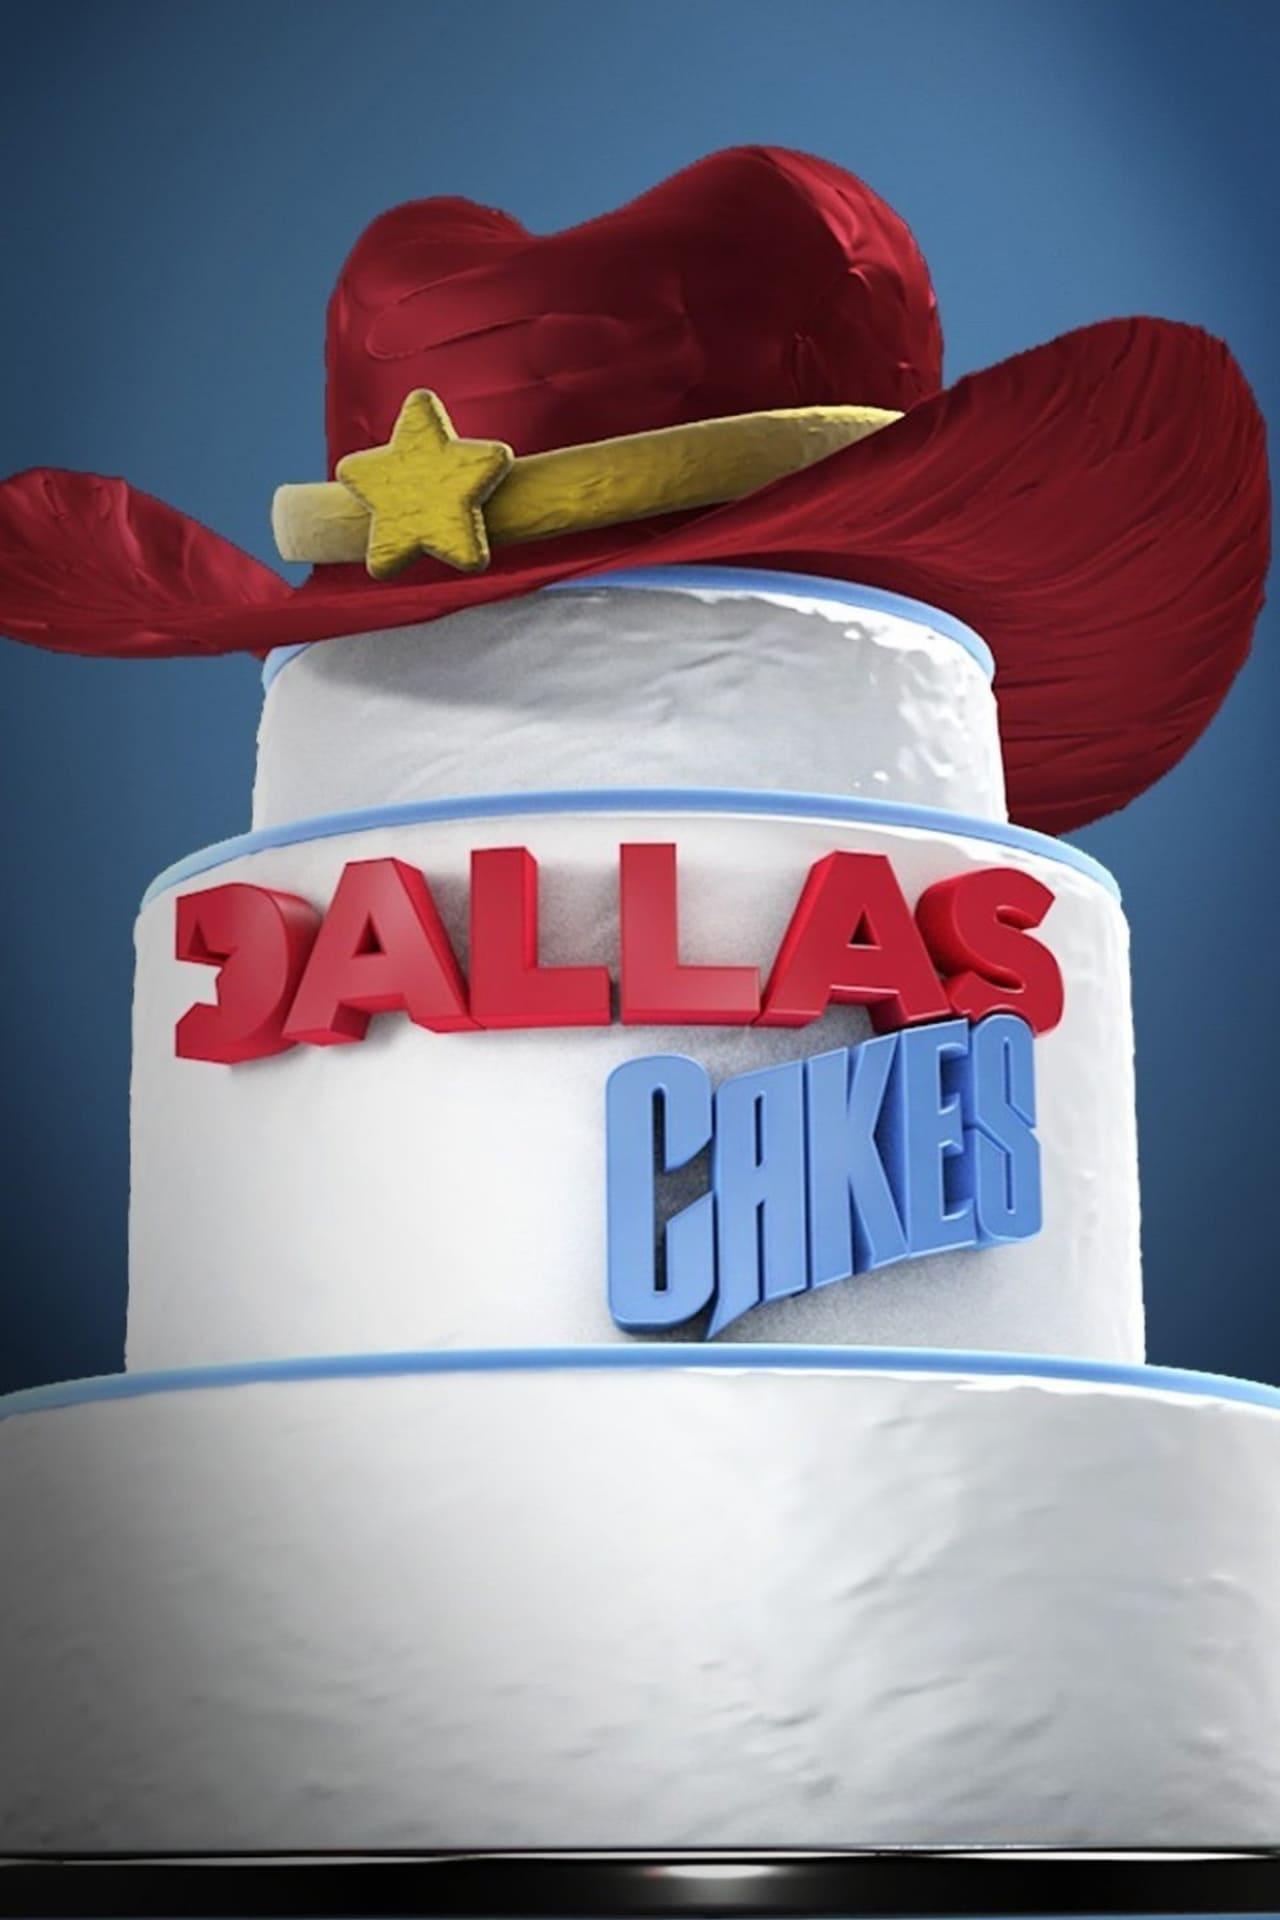 Marvelous Dallas Cakes 2017 Imdb Funny Birthday Cards Online Hetedamsfinfo